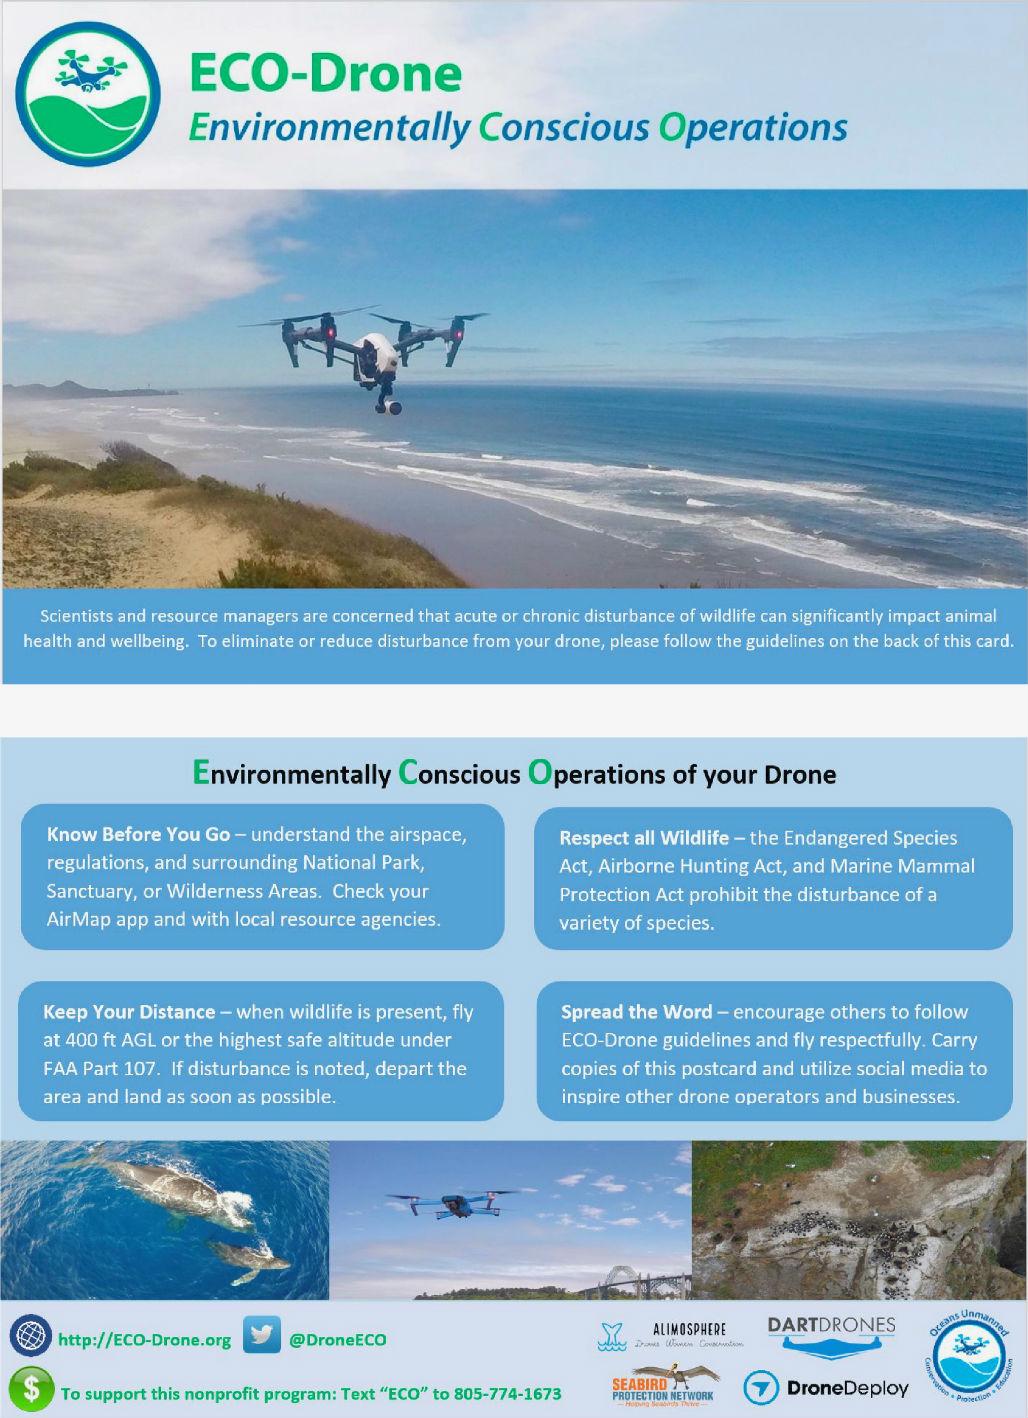 ECO-Drone Postcard